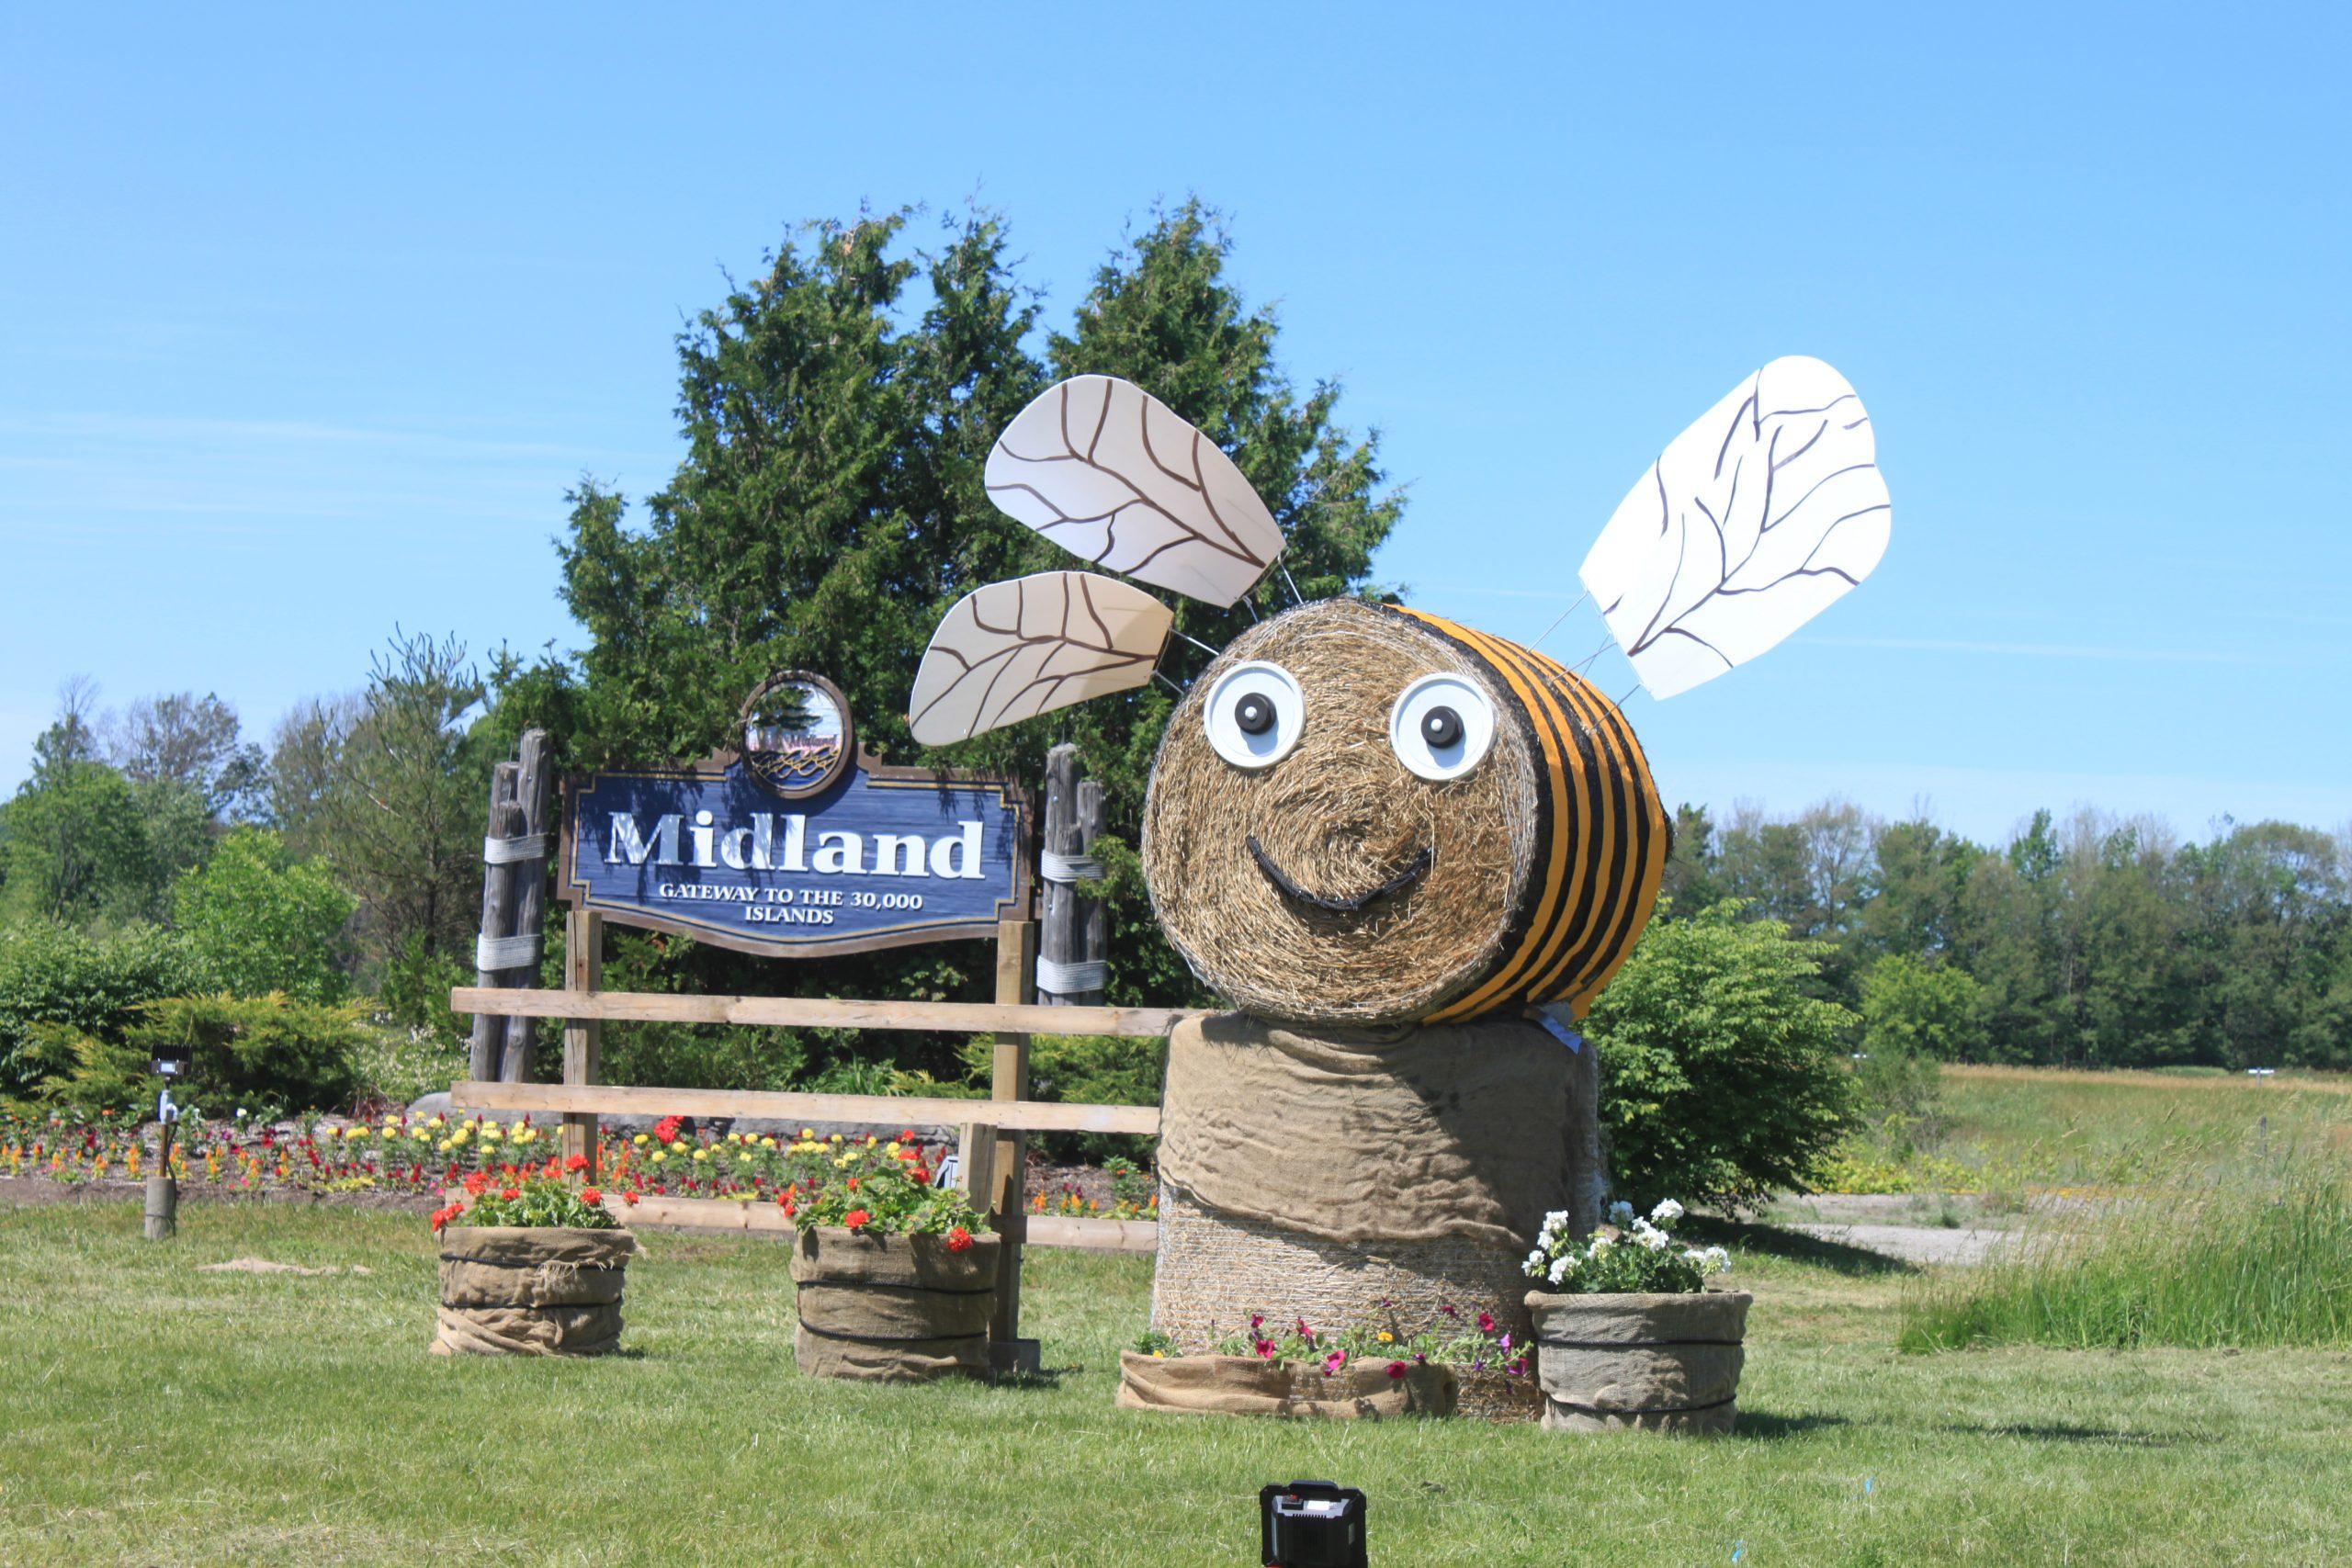 Town of Midland Bee City Display June 2021